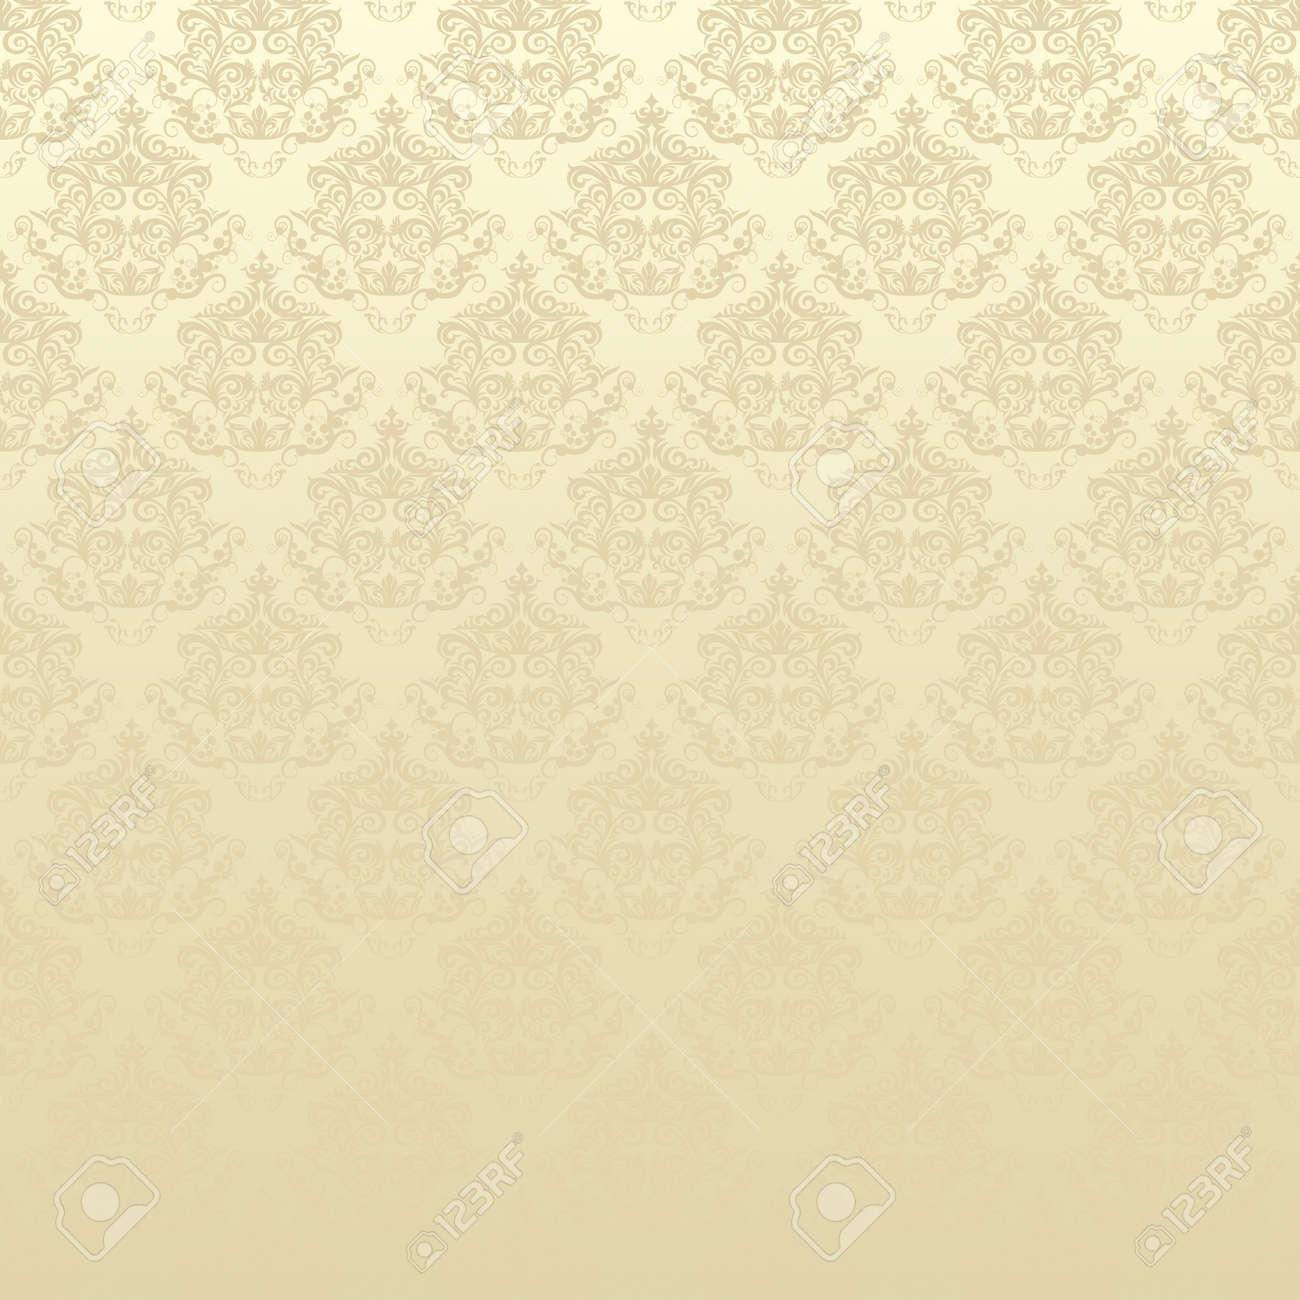 Damask seamless floral pattern Stock Photo - 18198513